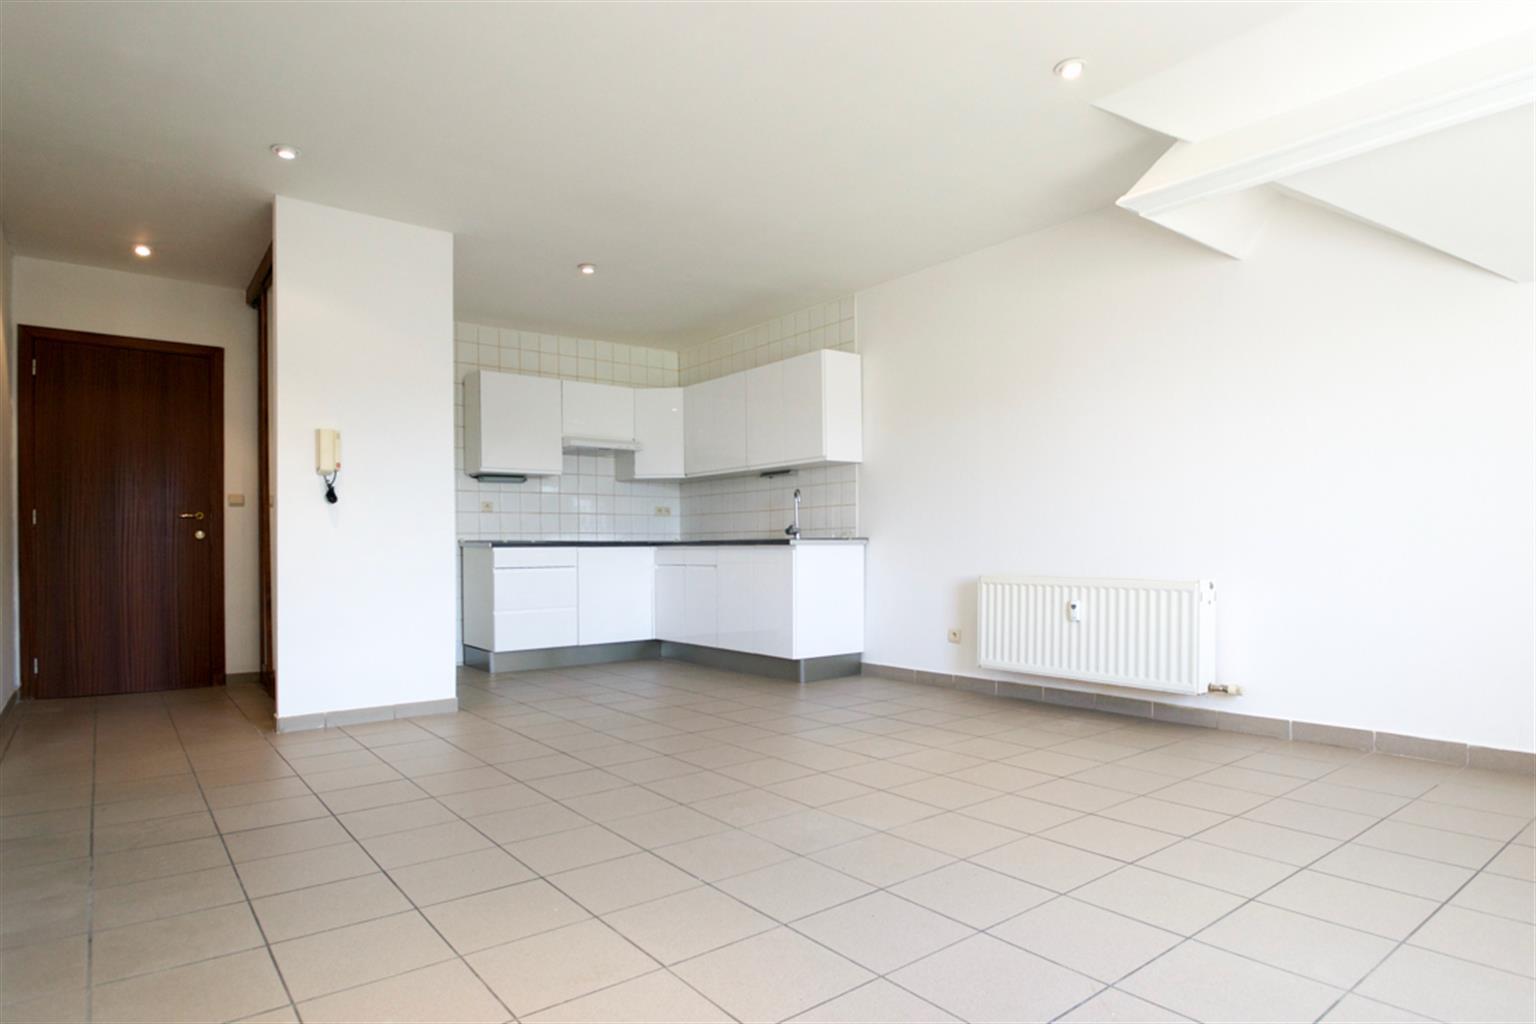 Appartement - Leval-Trahegnies - #3454438-1